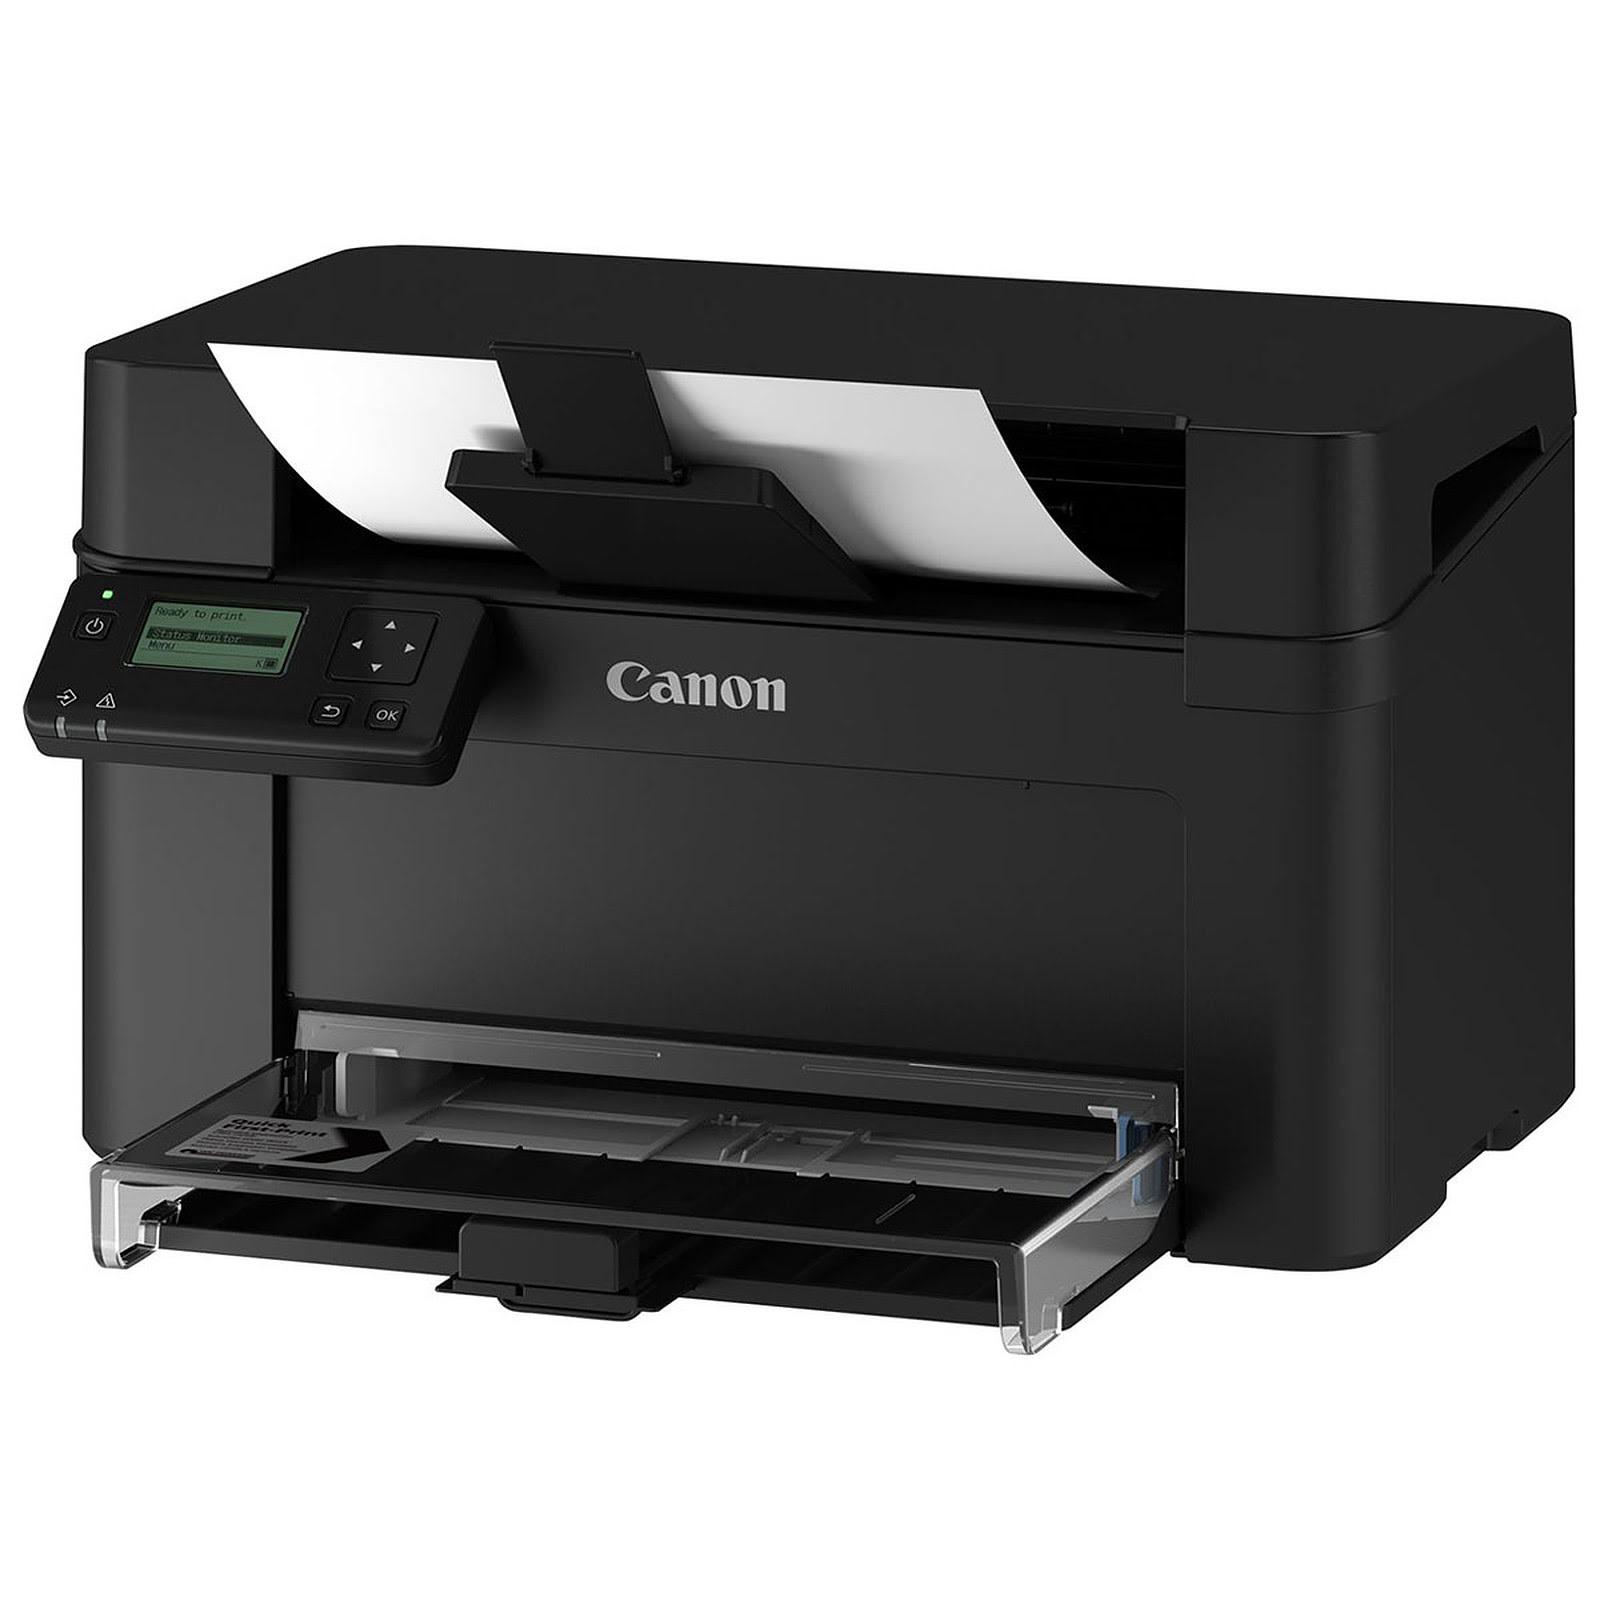 Imprimante Canon I-SENSYS LBP113W - Cybertek.fr - 3